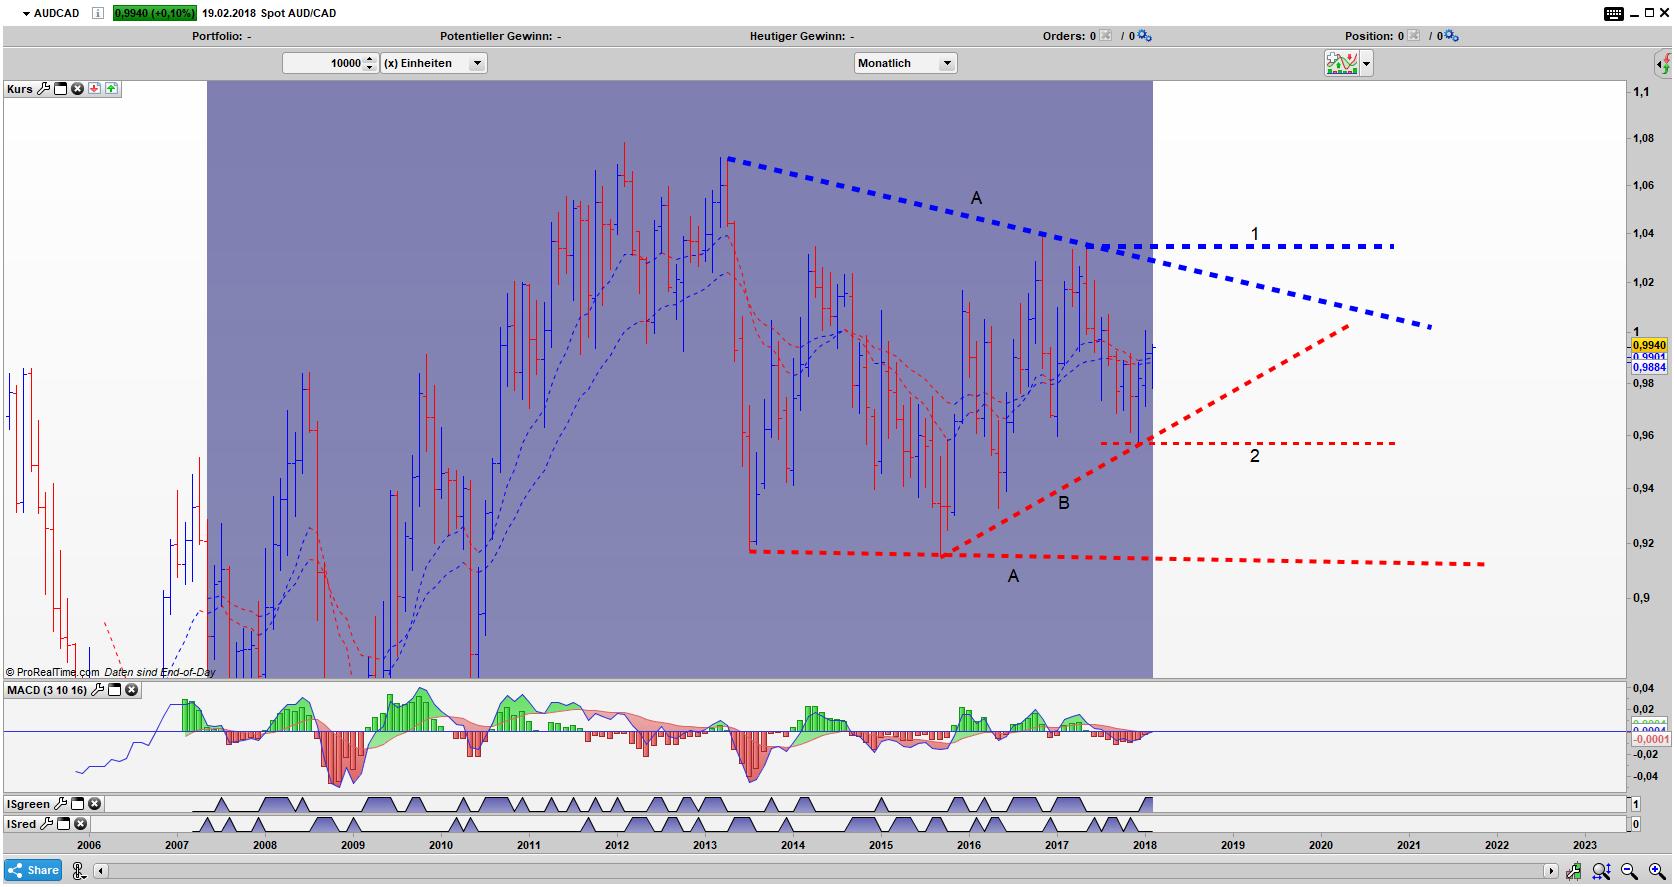 AUD/CAD Bar Monats Chart: Aktiver Umkehrstab innerhalb eines Dreiecks